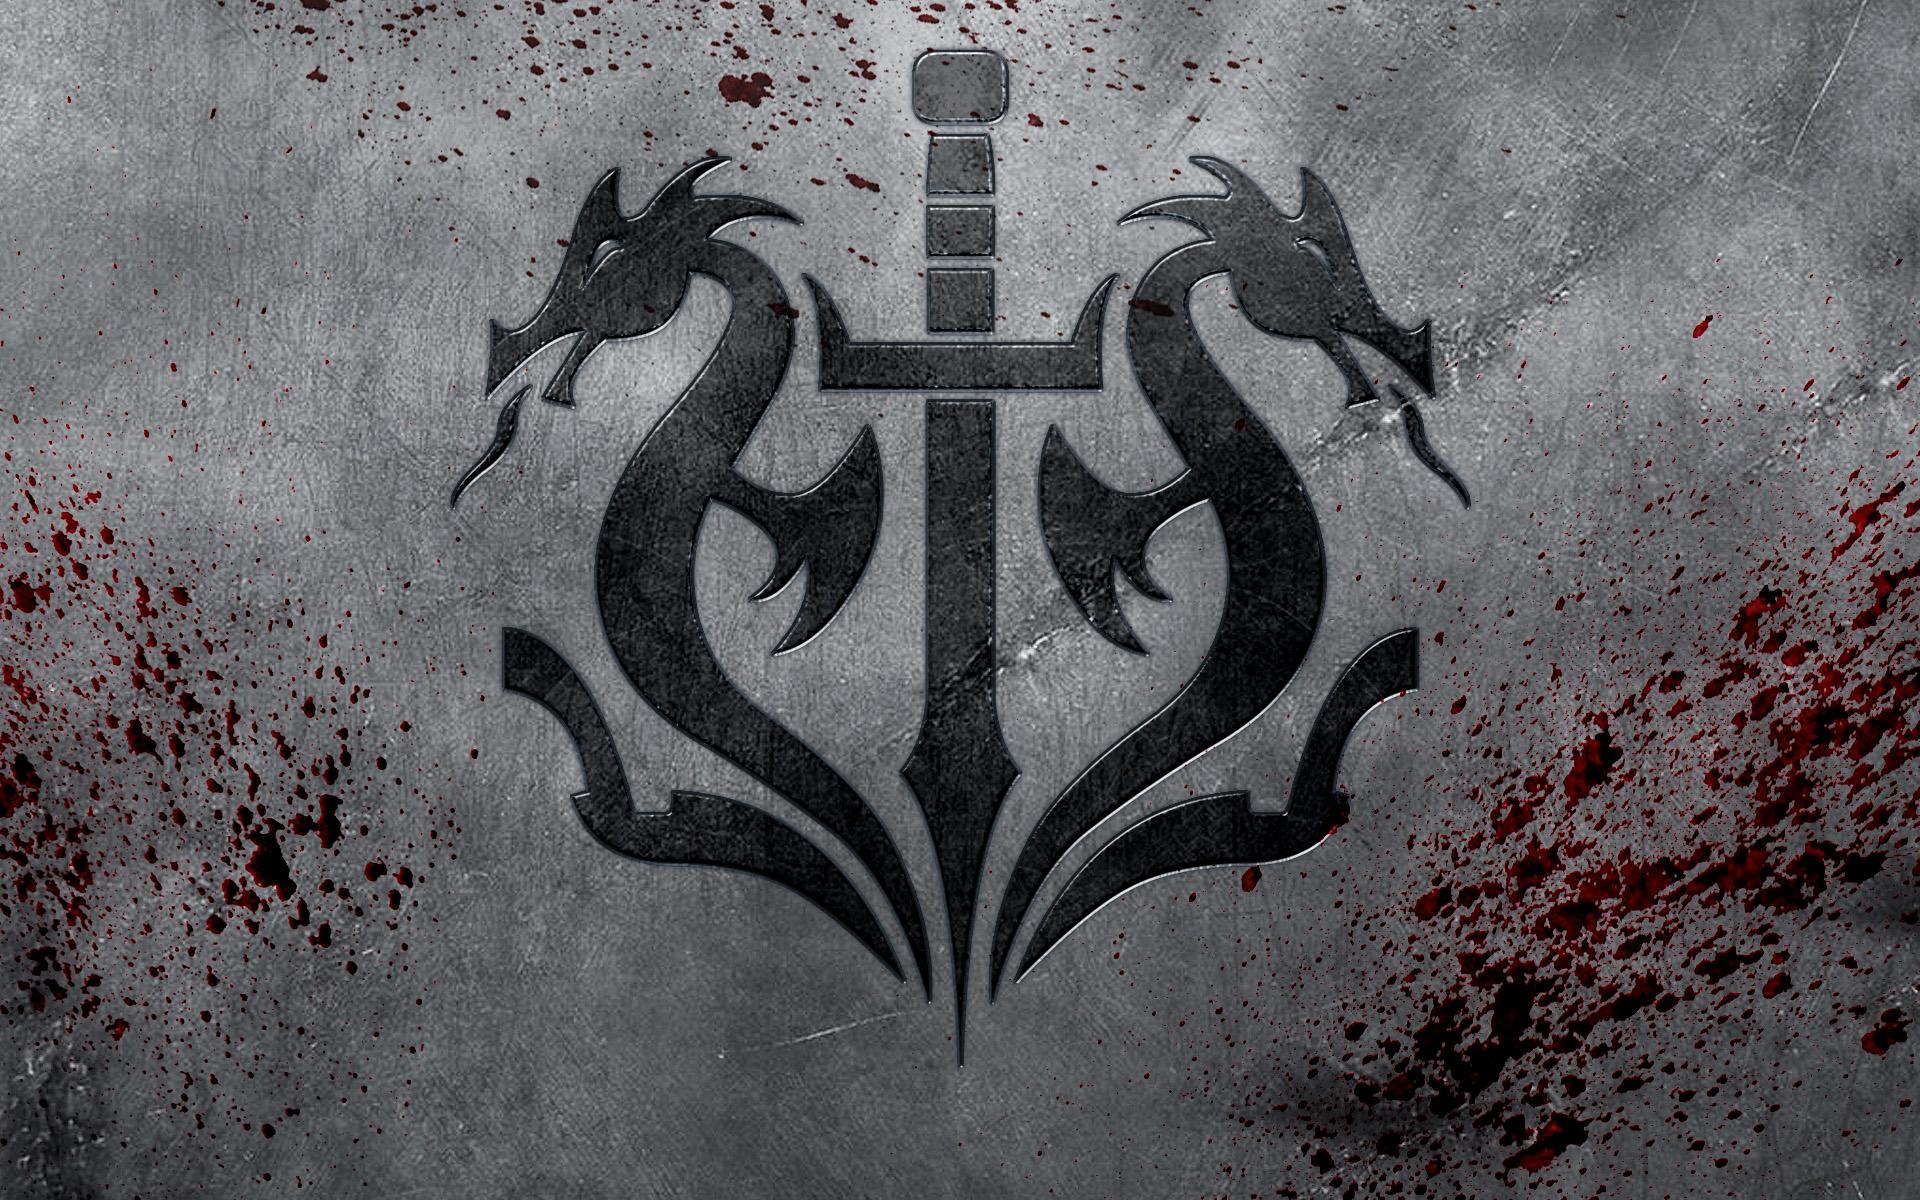 Must see Wallpaper Logo Dragon - black_dragon_wallpaper_by_molim-d8nhr42  Collection_602014.jpg